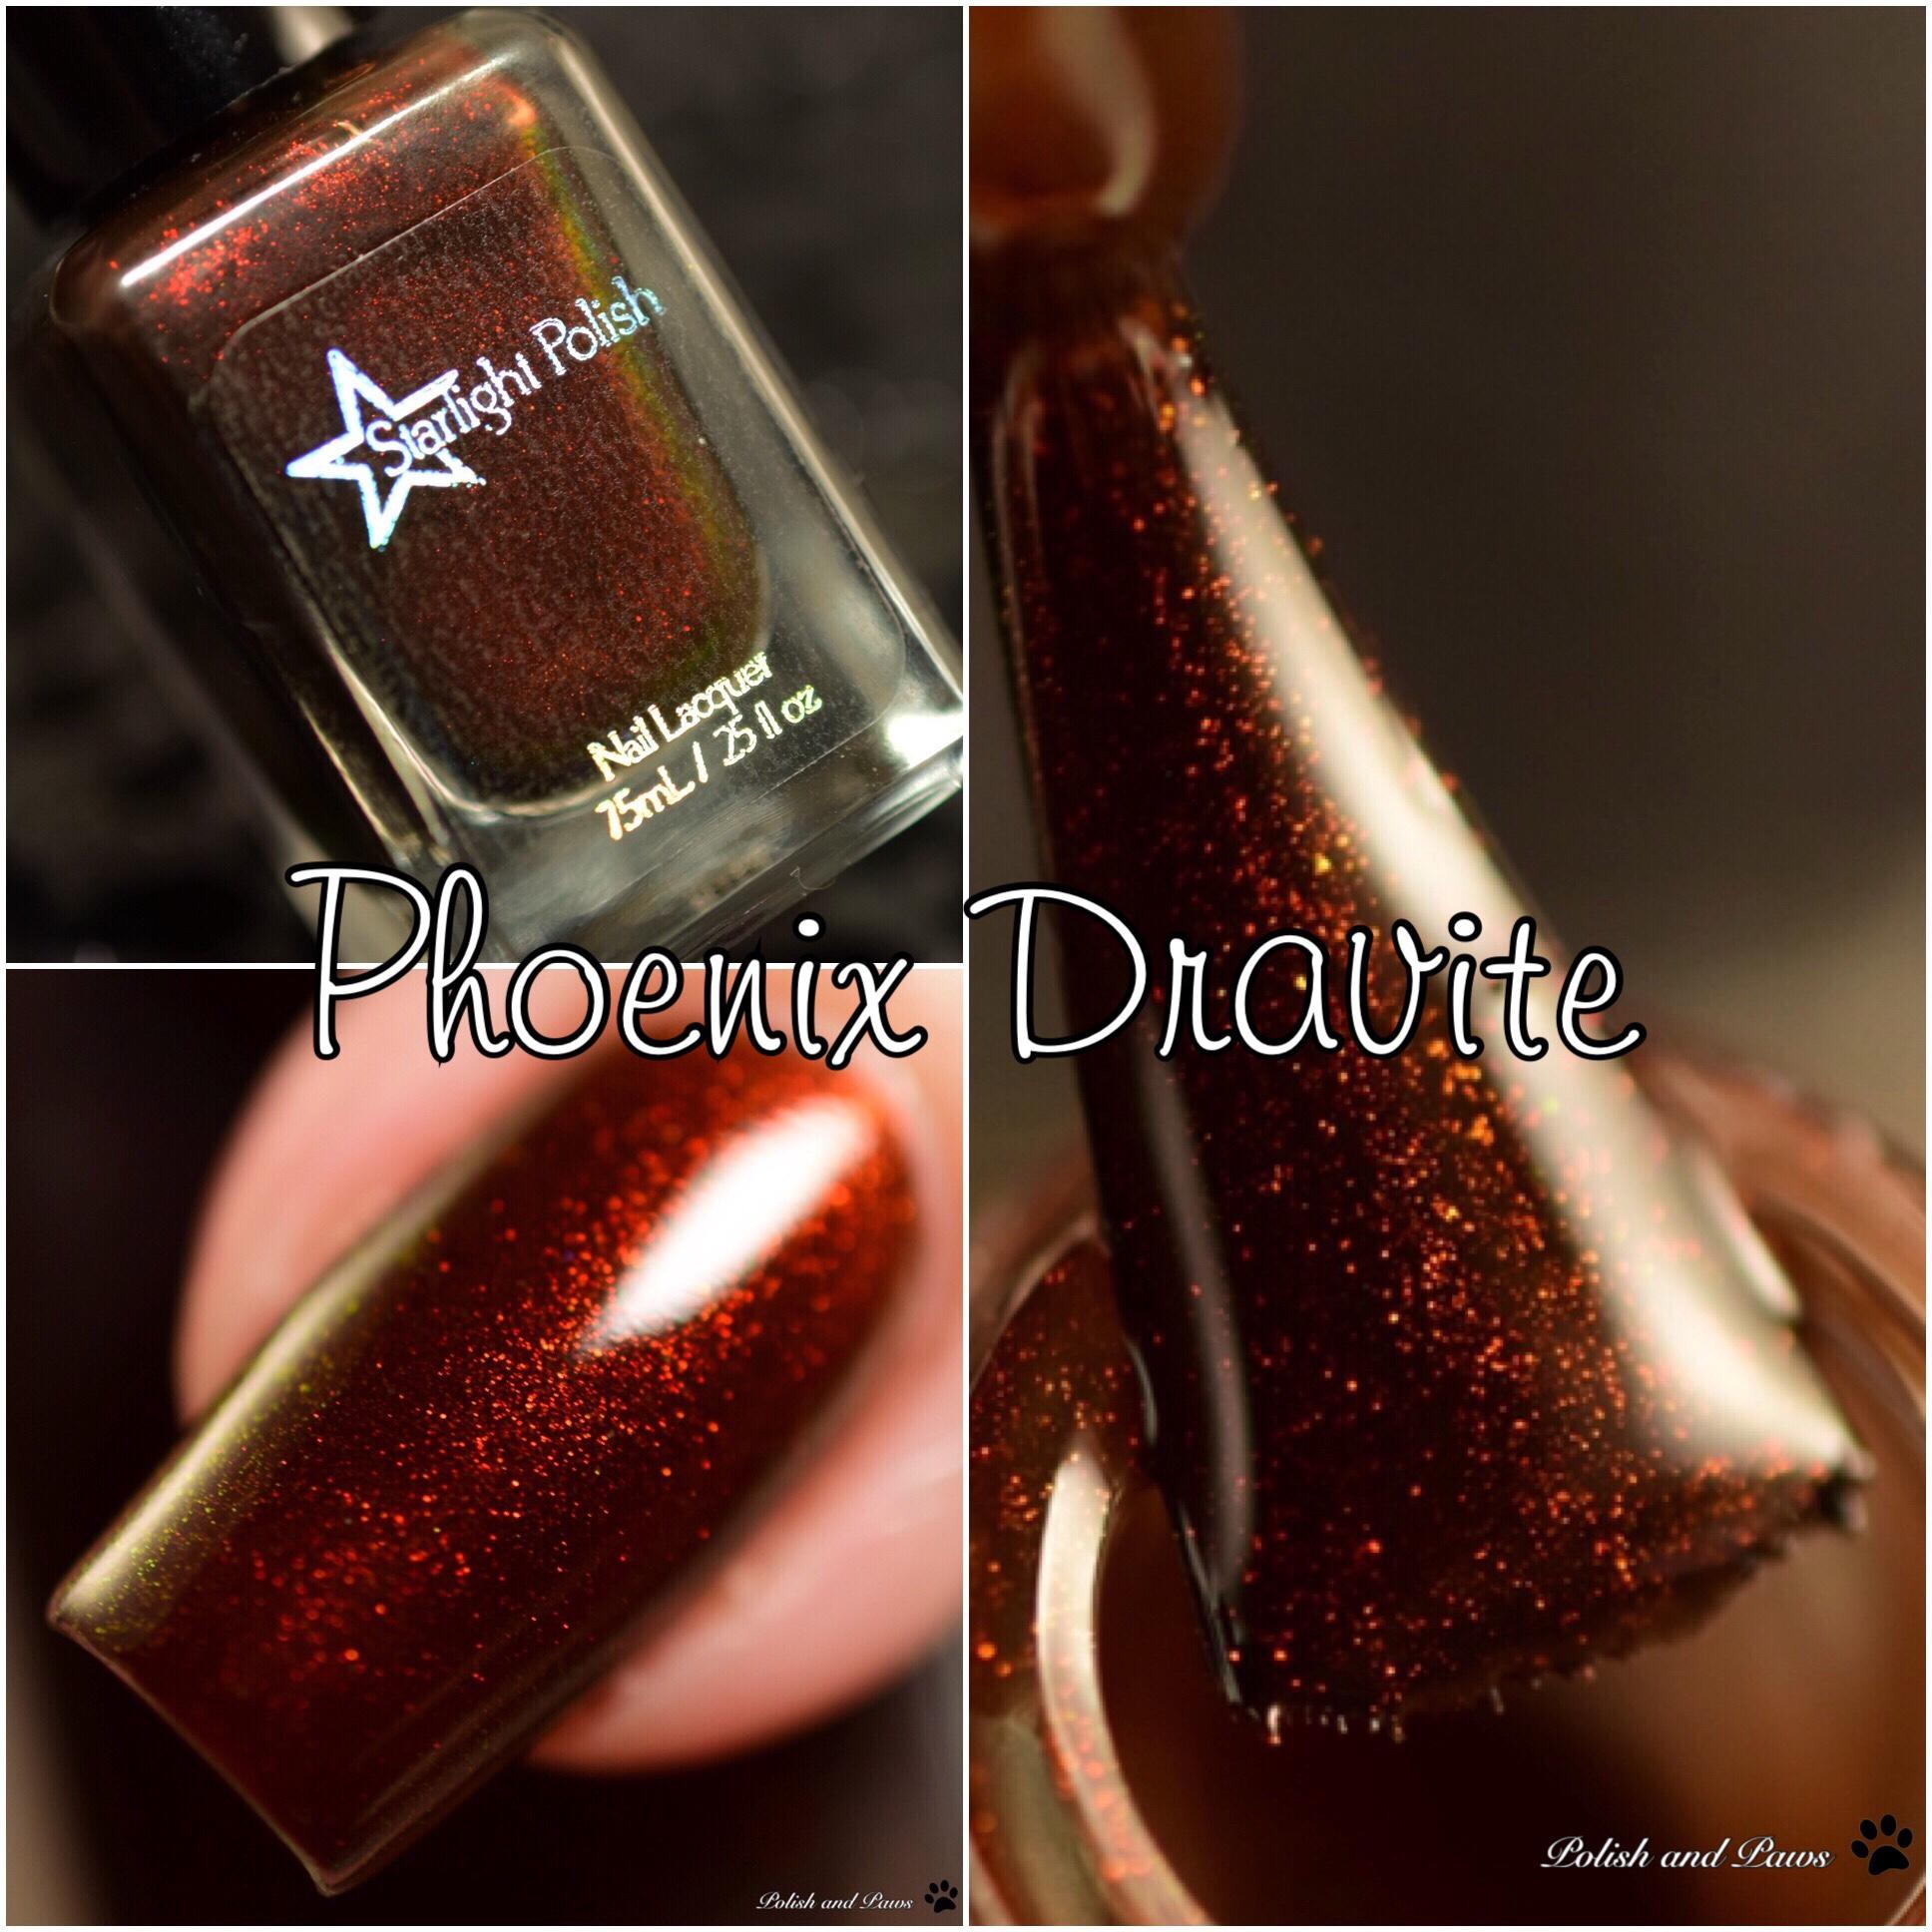 Starlight Polish Phoenix Dravite